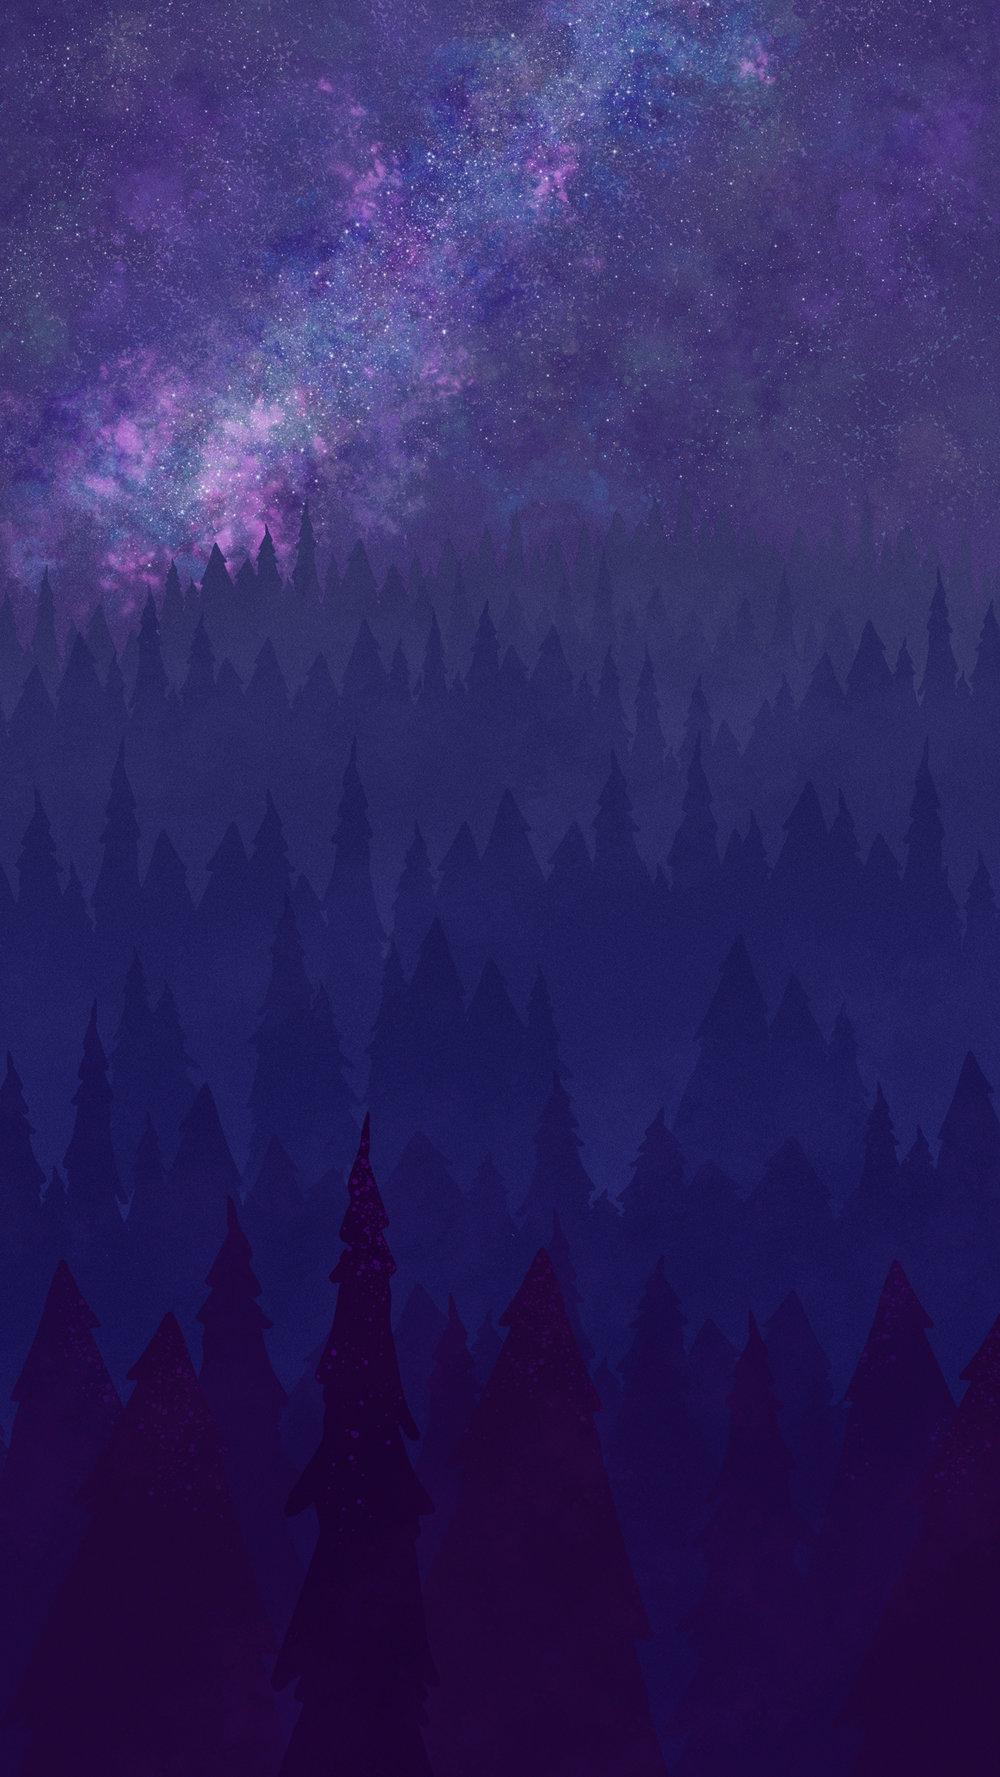 Trees-and-stars-night-small.jpg